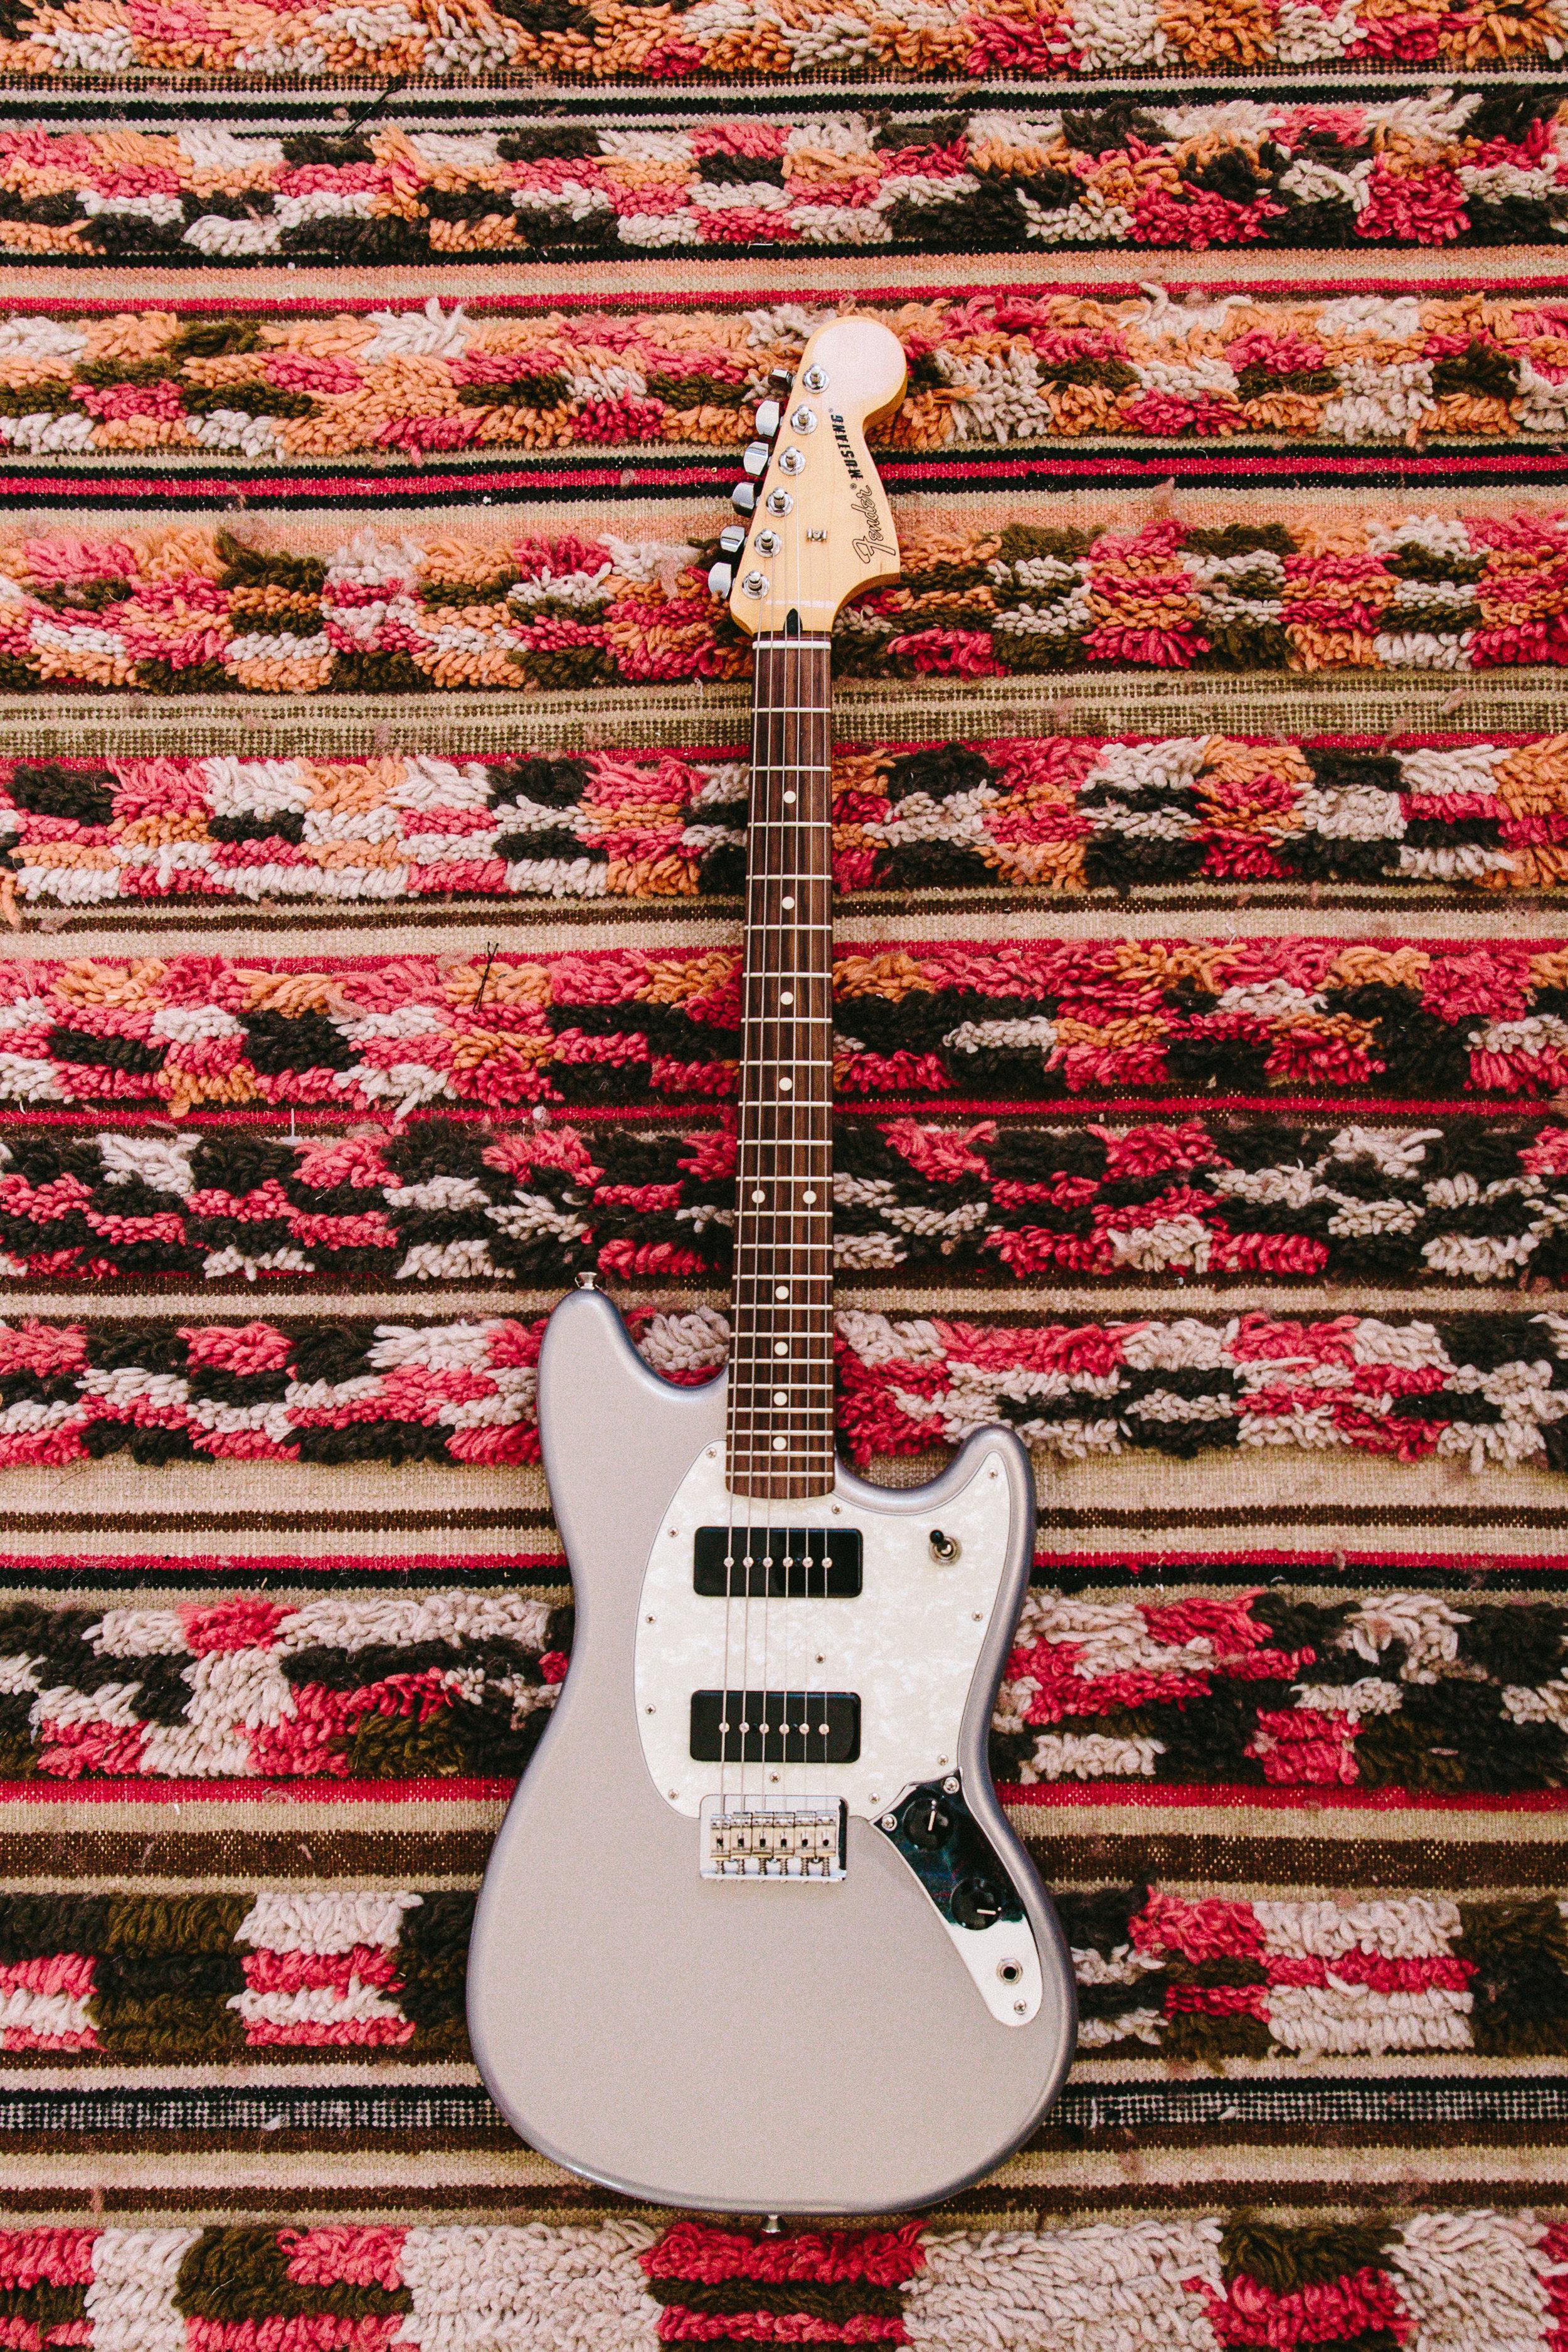 Fender-Offsets-Juarez-8968.jpg